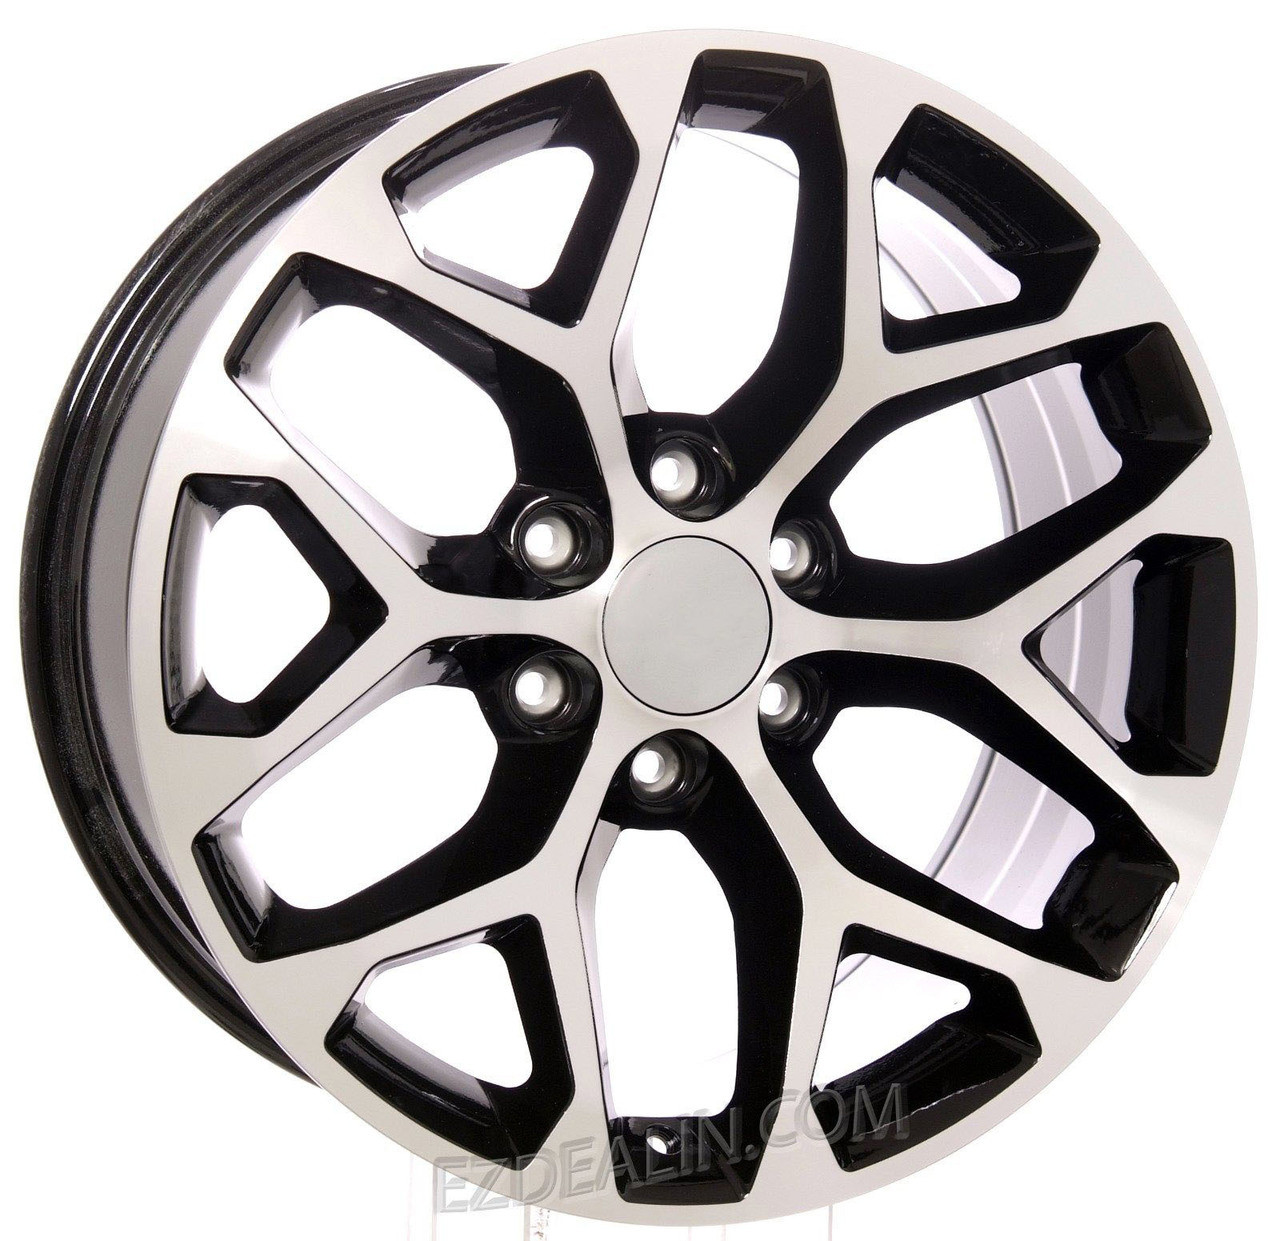 "Black and Machine 20"" Snowflake Wheels for GMC Sierra, Yukon, Denali - New Set of 4"